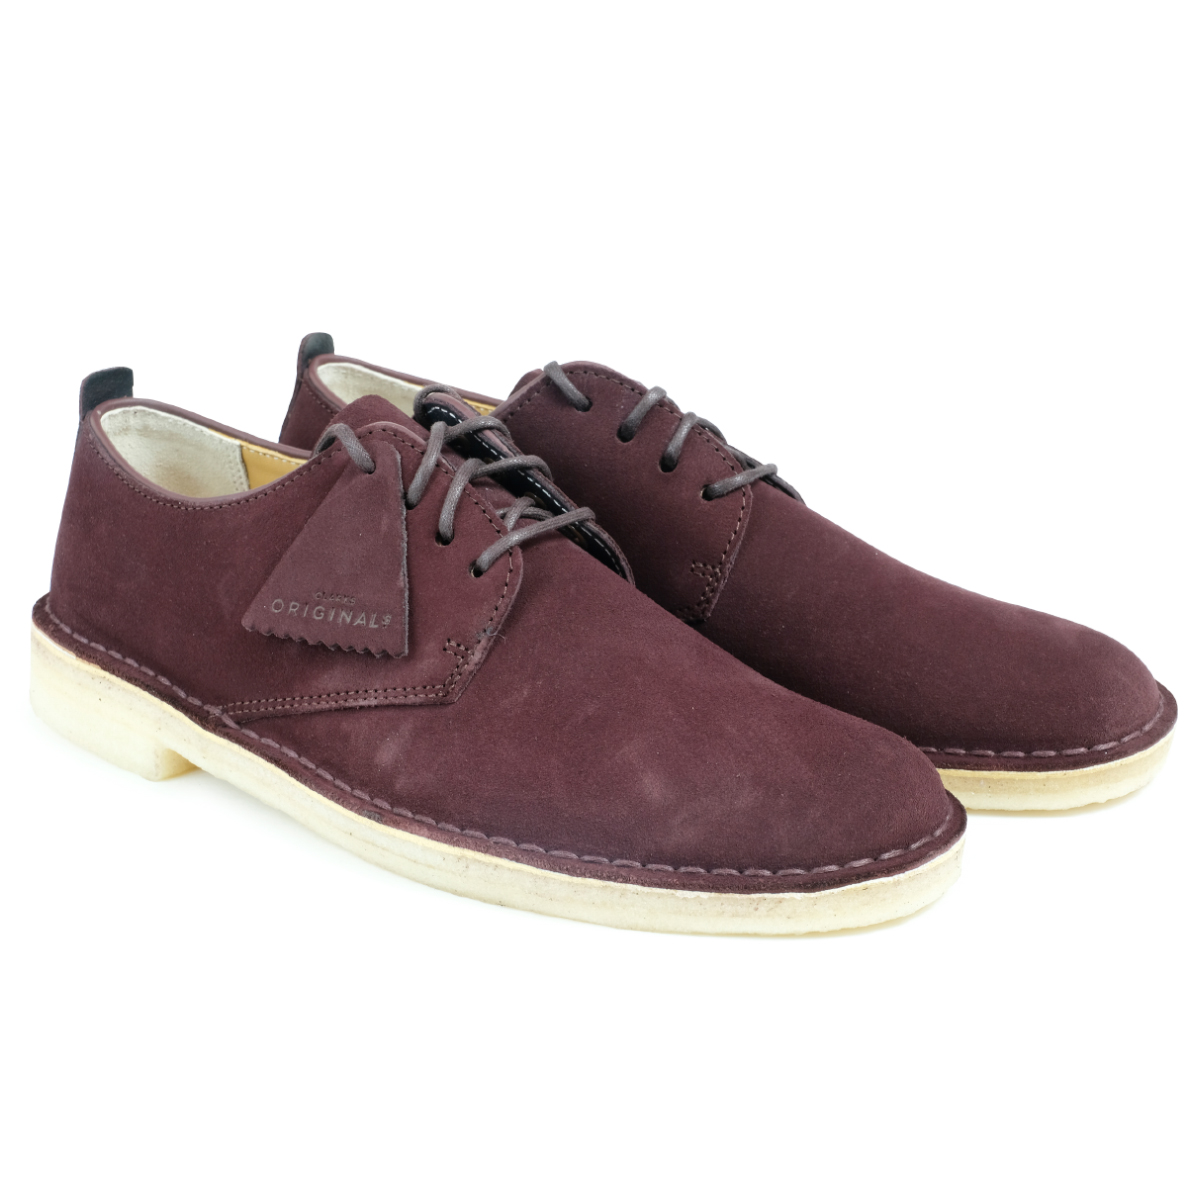 Clarks DESERT LONDON クラークス デザート ロンドン シューズ メンズ 2628511 靴 バーガンディー